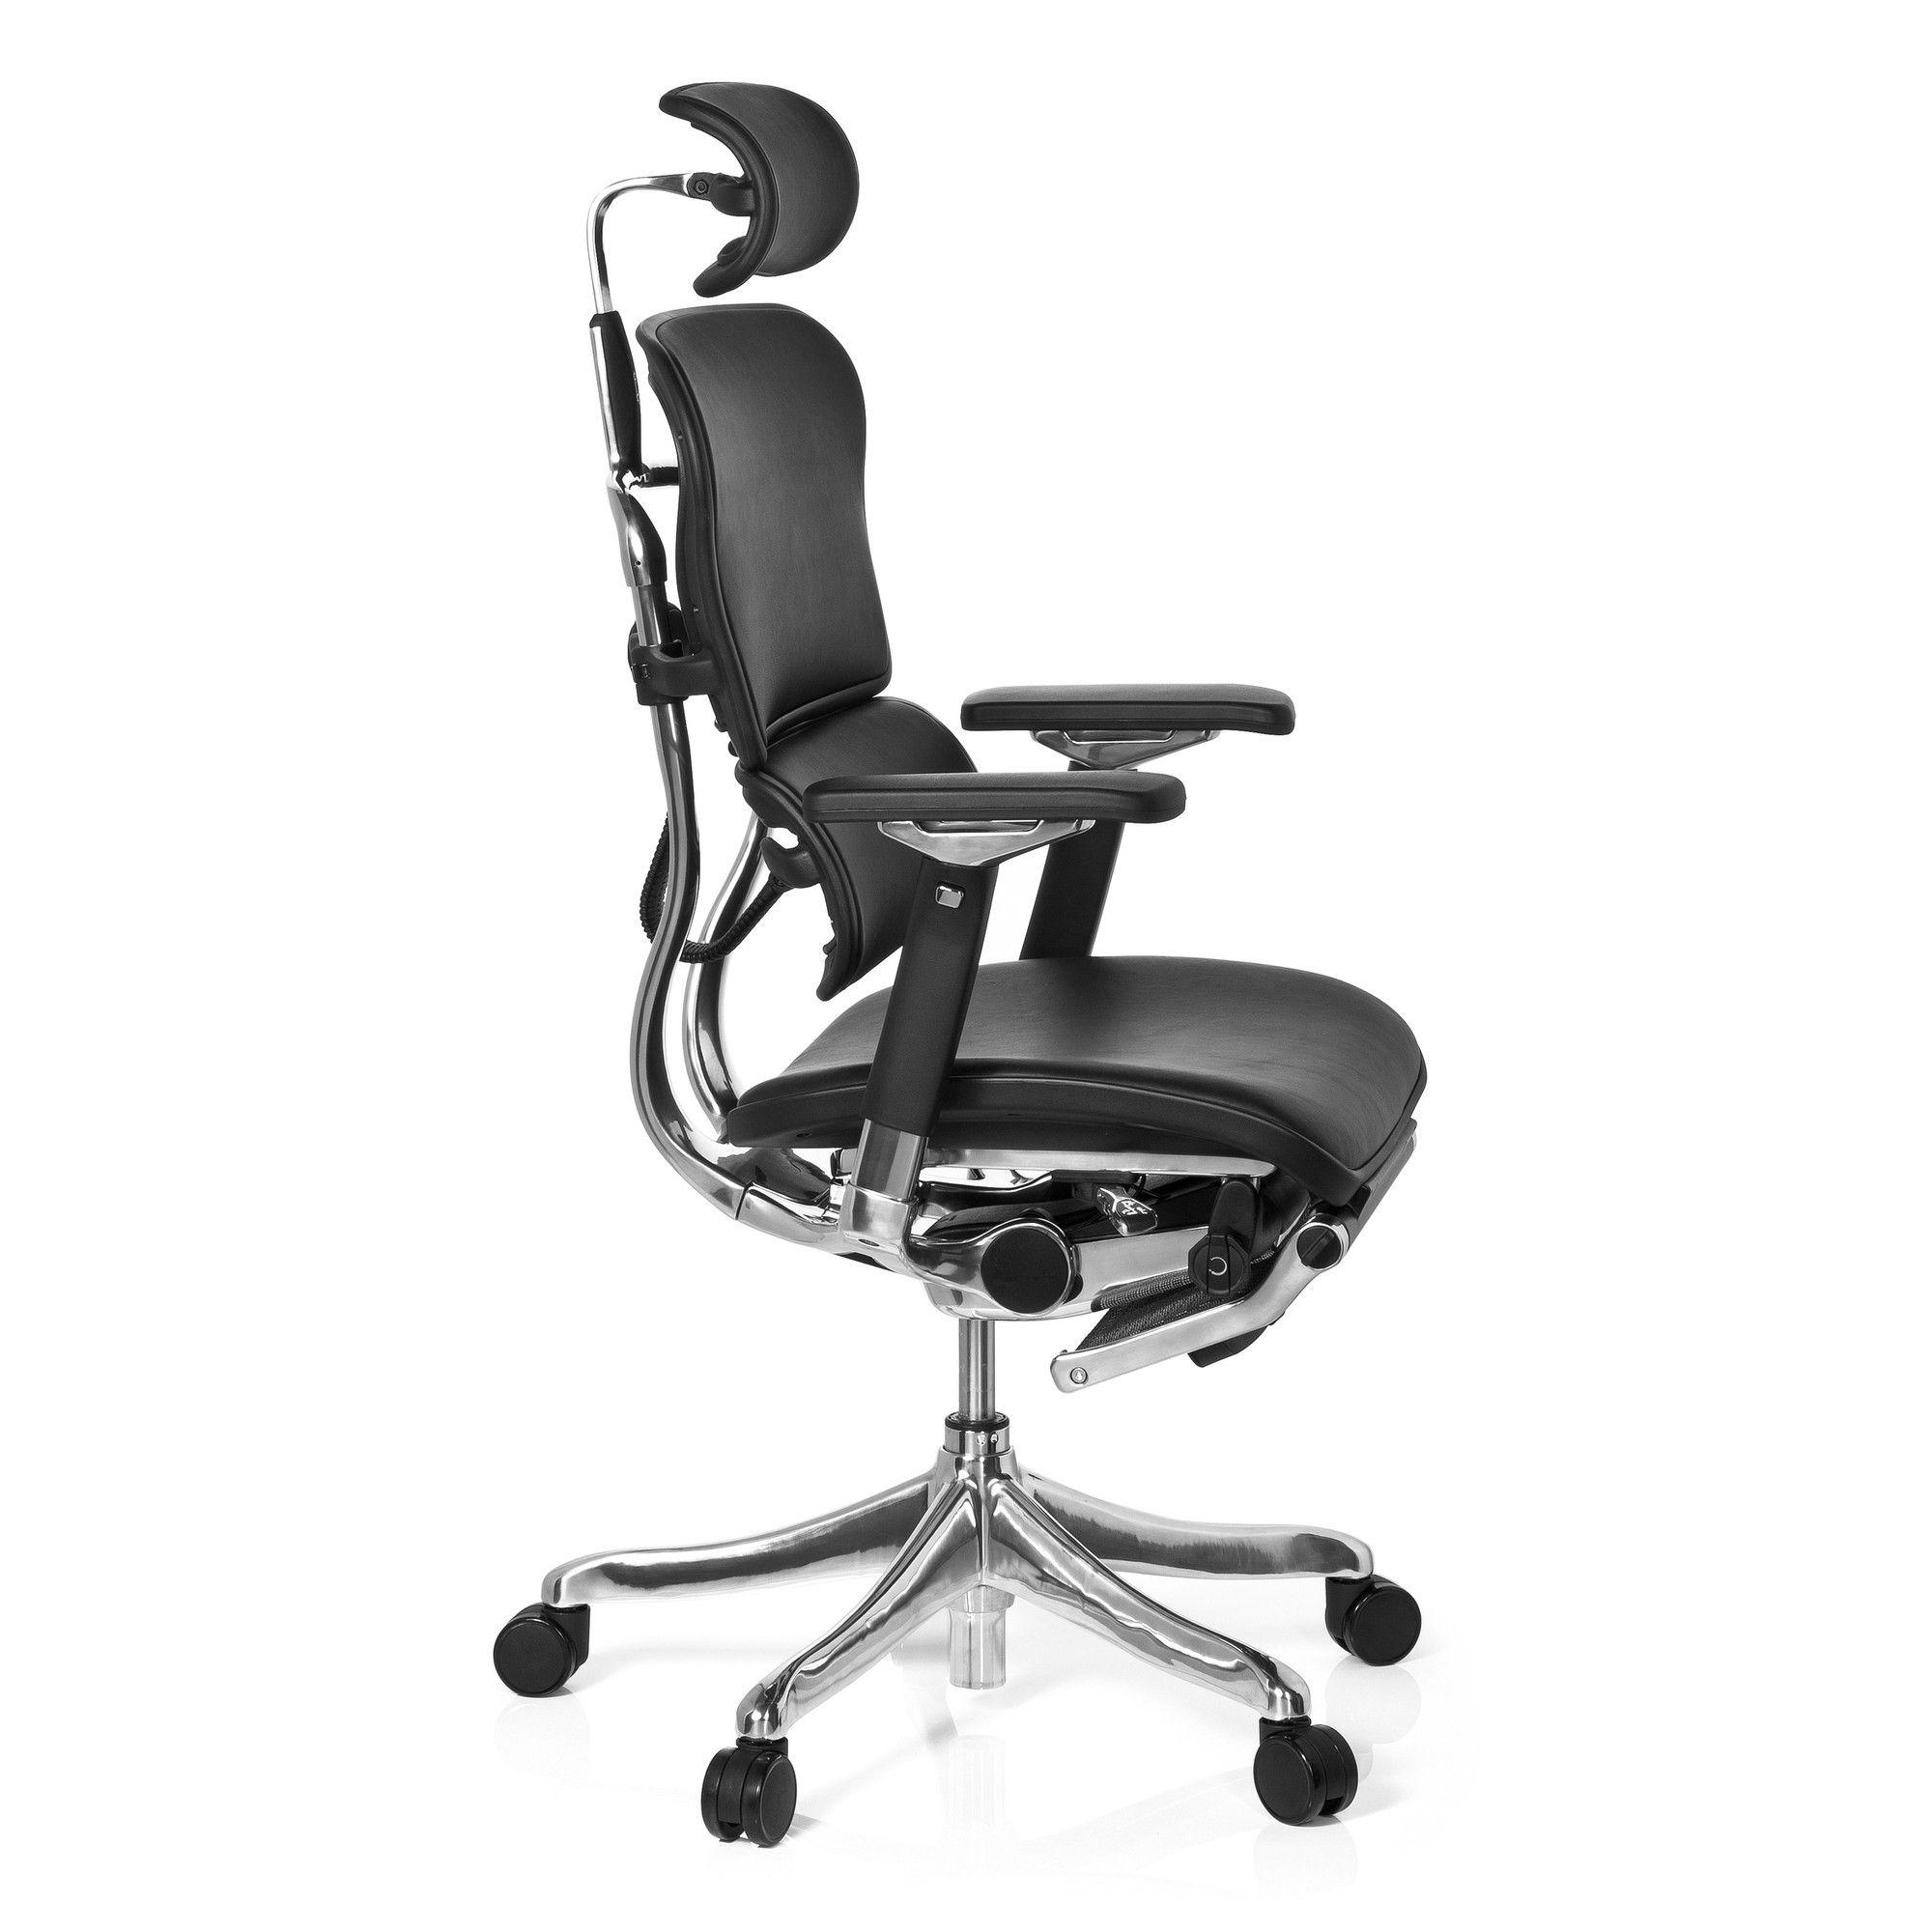 b rostuhl chefsessel ergohuman plus legpro mit beinablage leder schwarz hjh office b2b. Black Bedroom Furniture Sets. Home Design Ideas